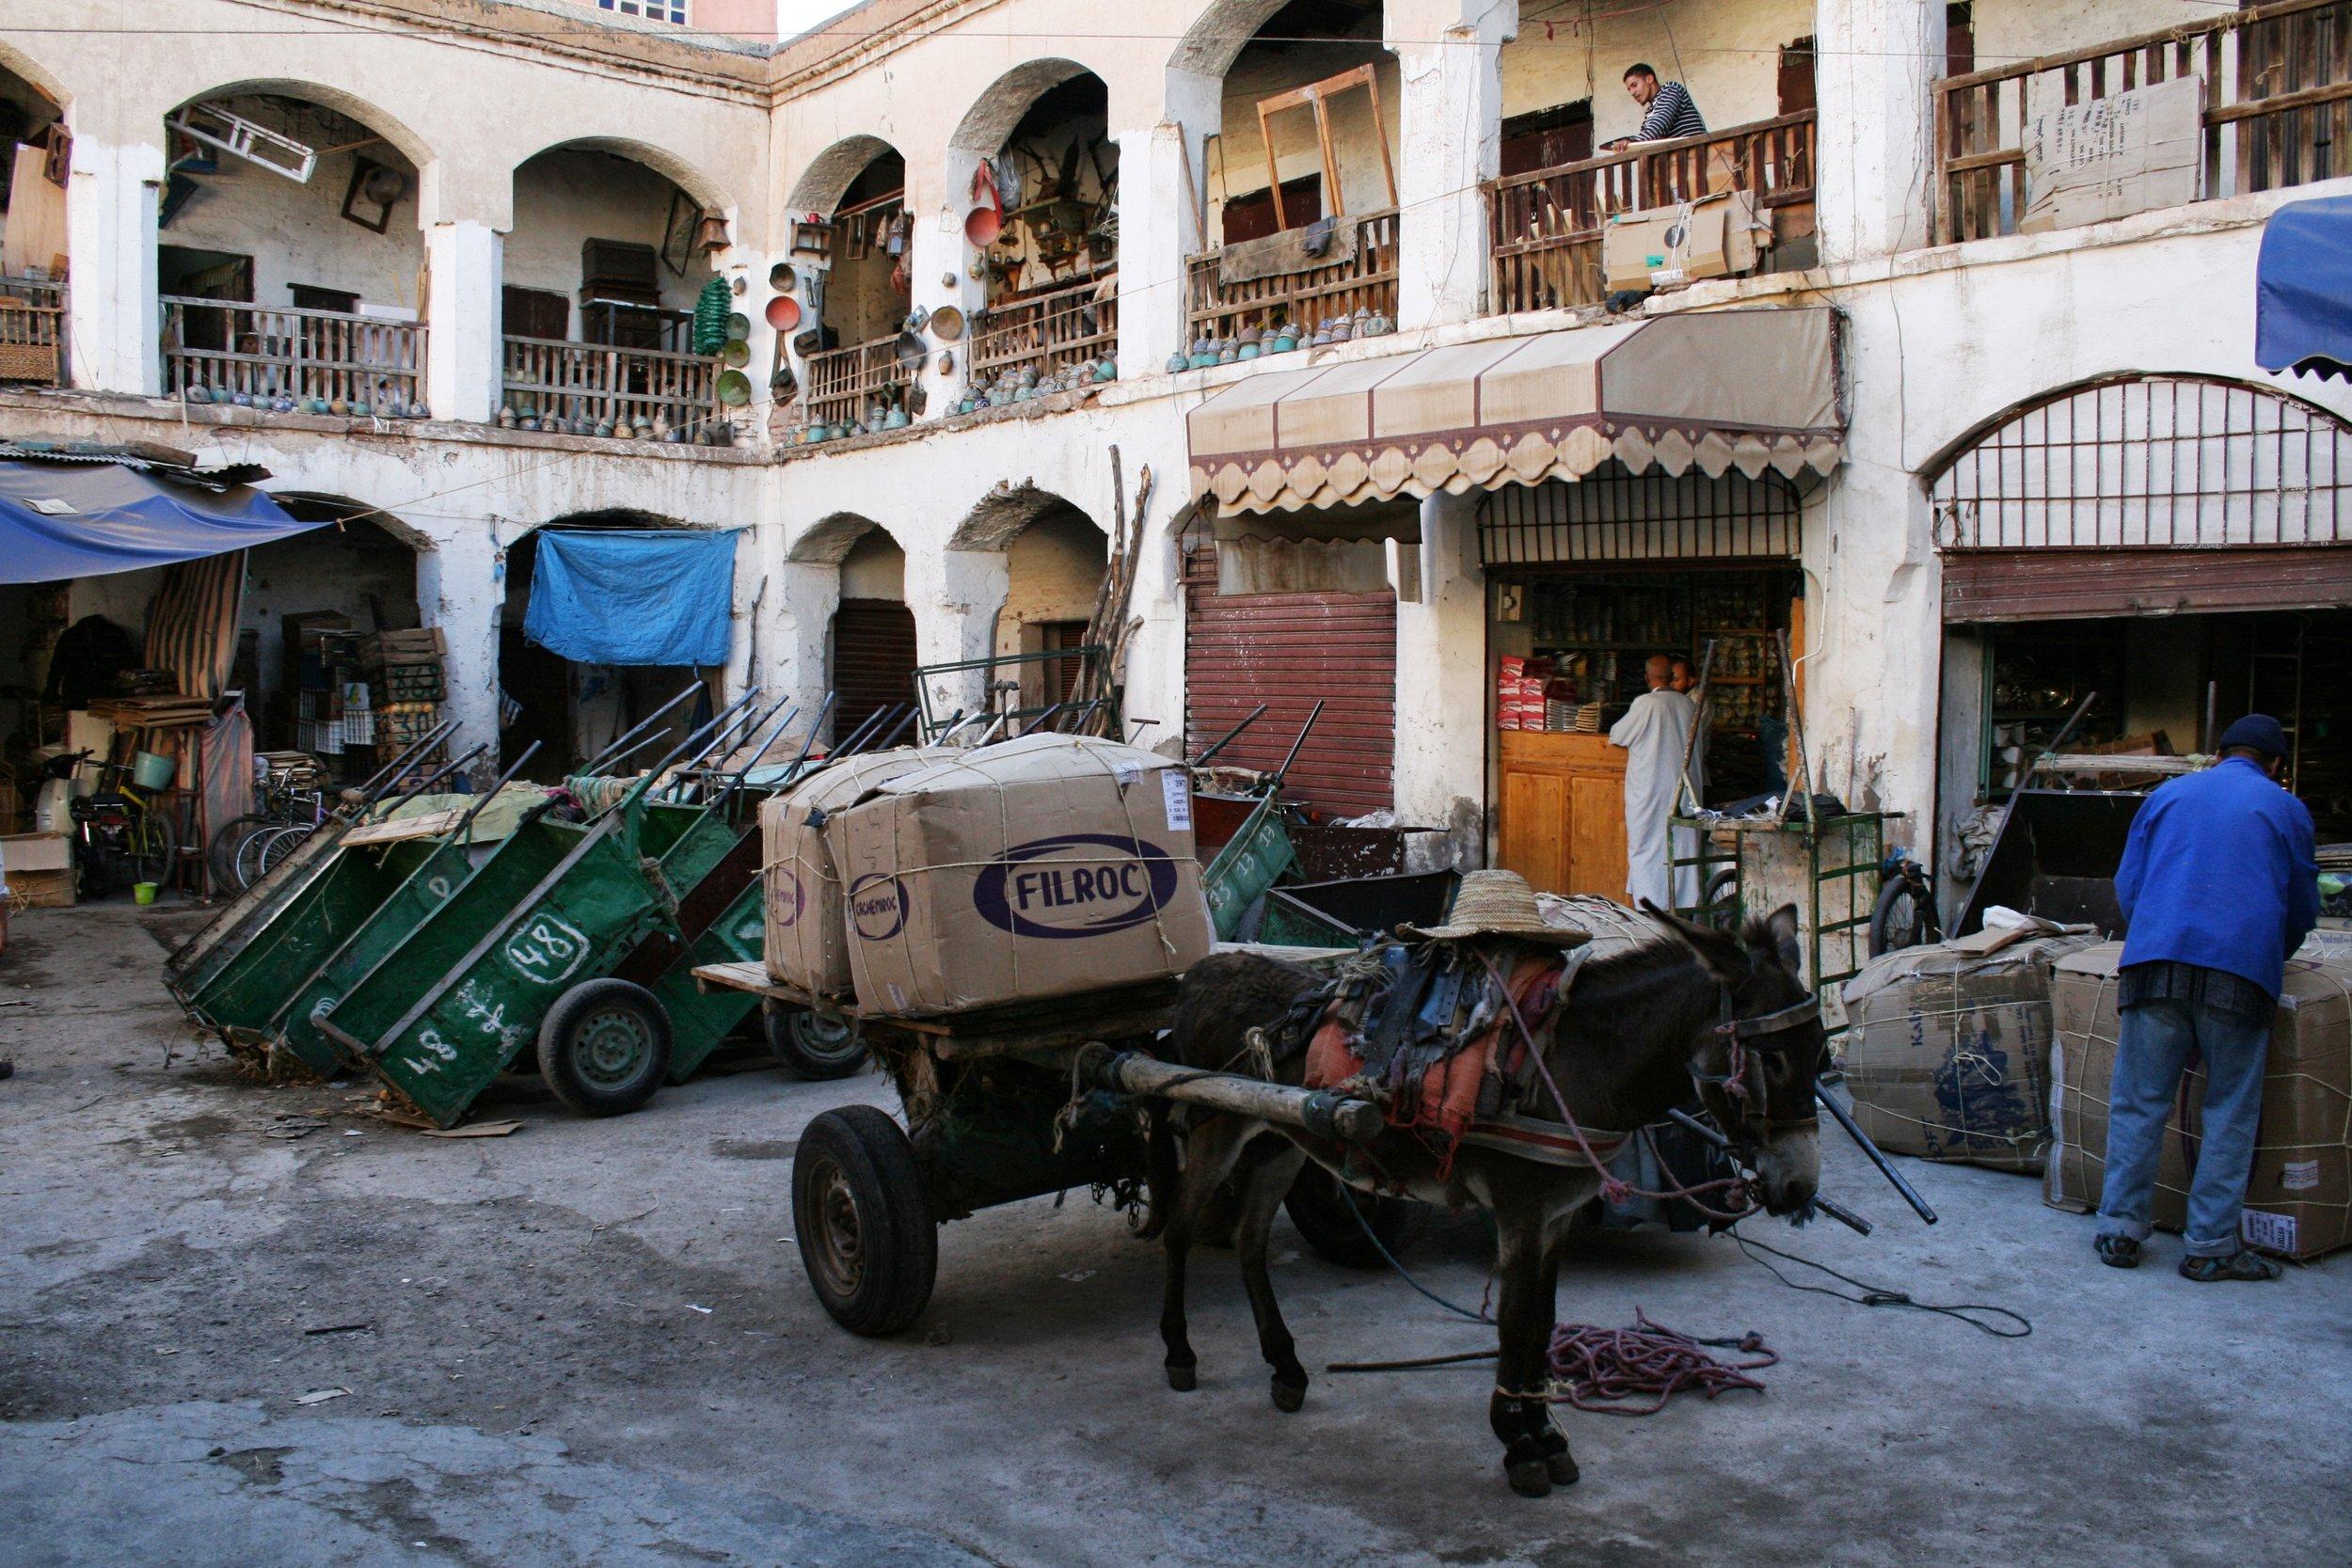 Morocco 2009 - 2009_10_22 - IMG_5005.jpg